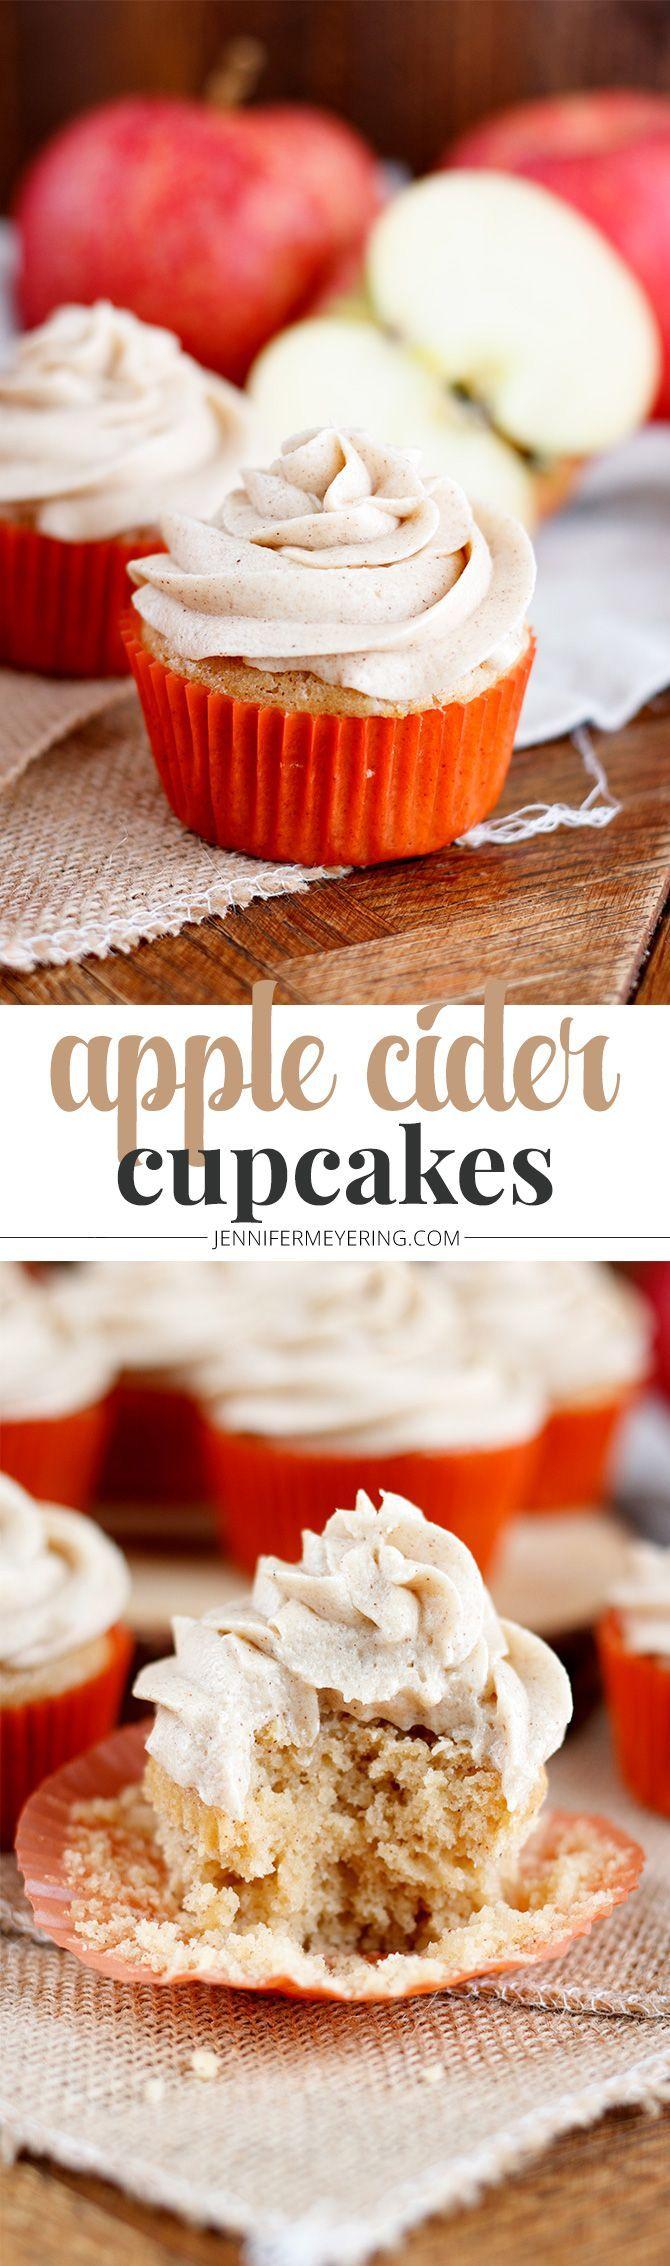 Apple Cider Cupcakes - JenniferMeyering.com